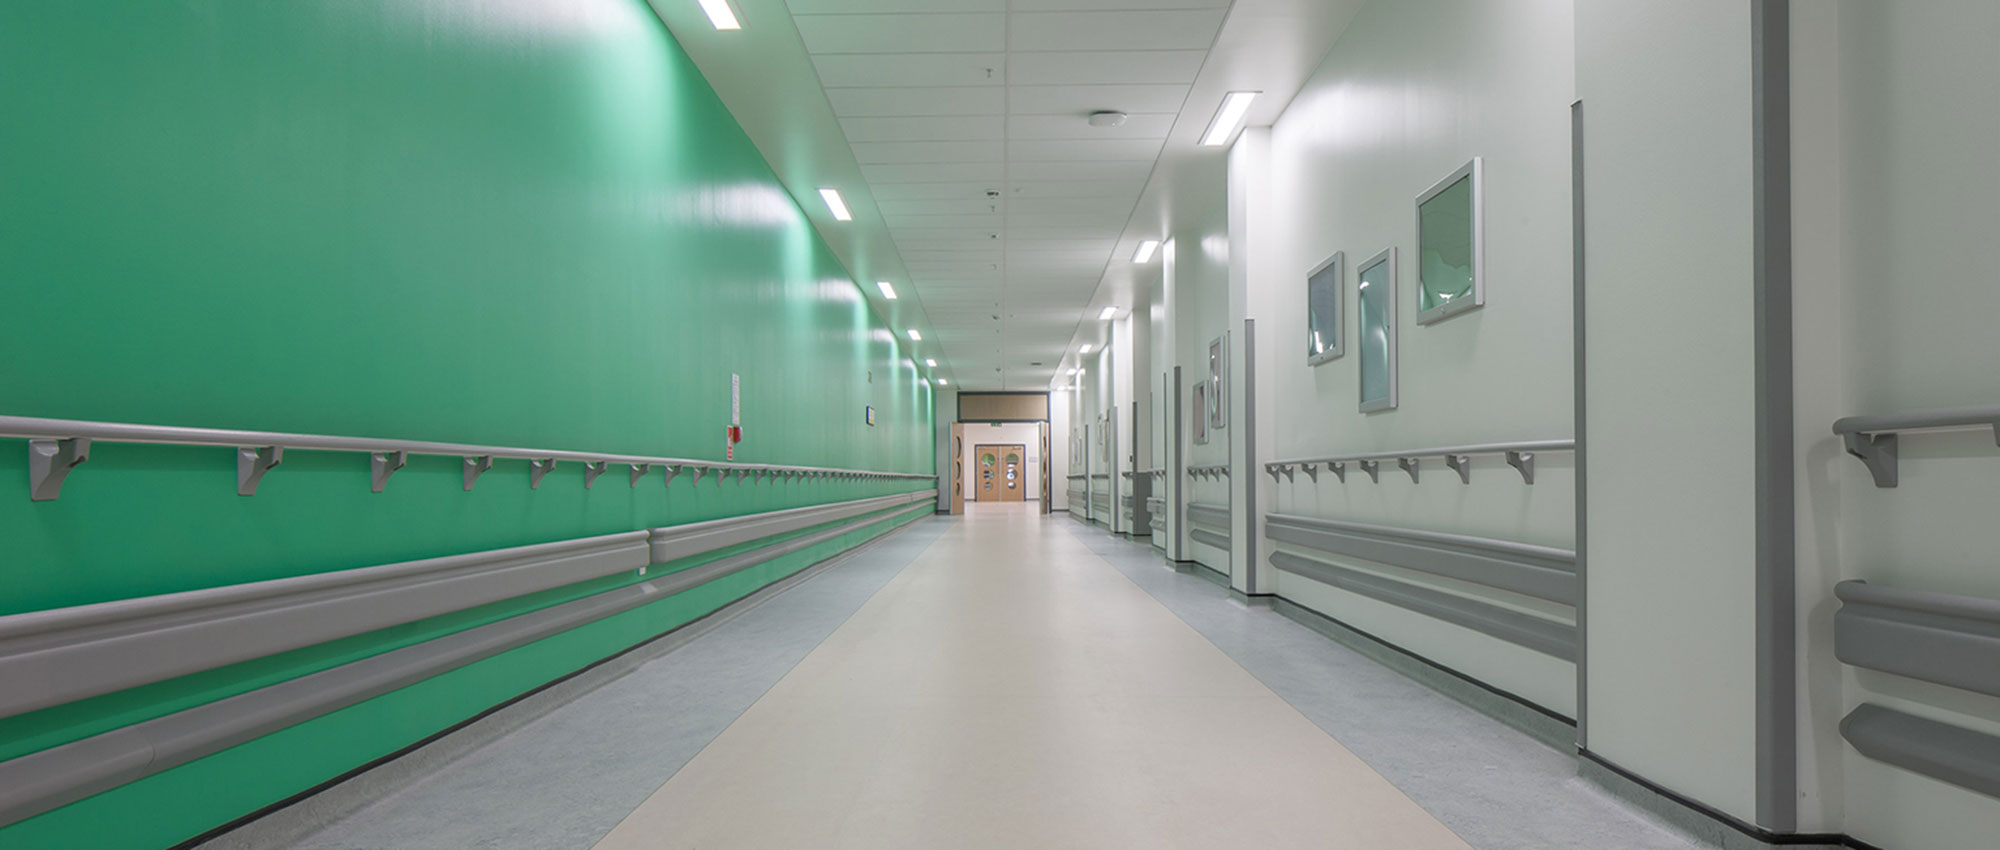 Case-Study-Queen-Elizabeth-University-Hospital-(6)